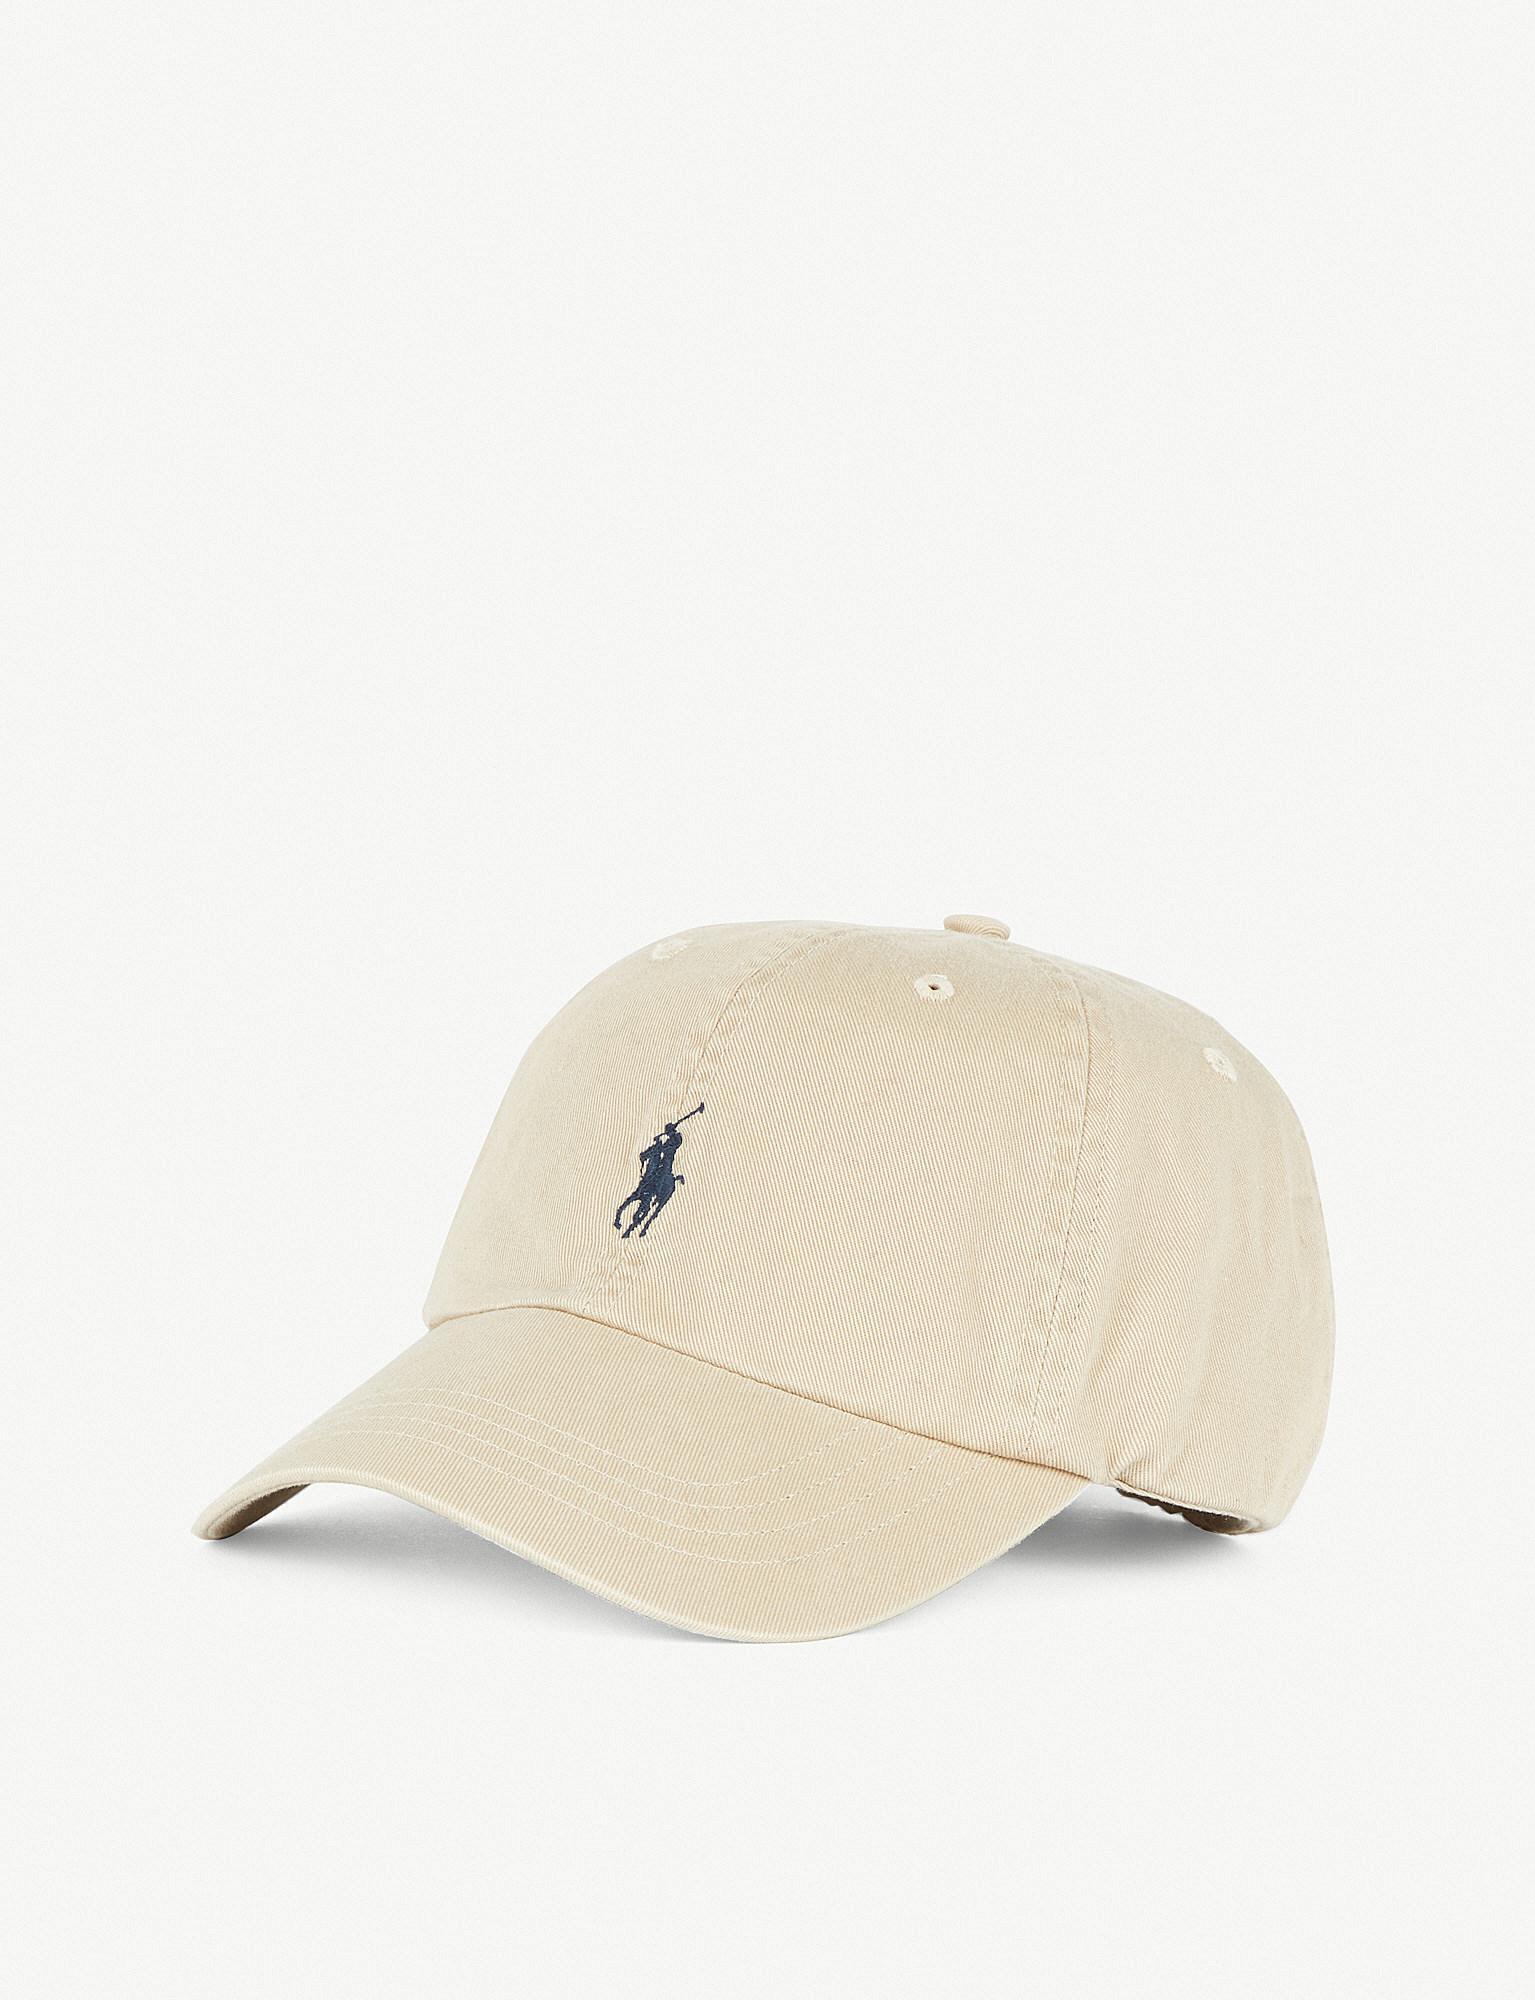 Lyst - Polo Ralph Lauren Classic Logo Cotton Cap in Natural 54427090ff40